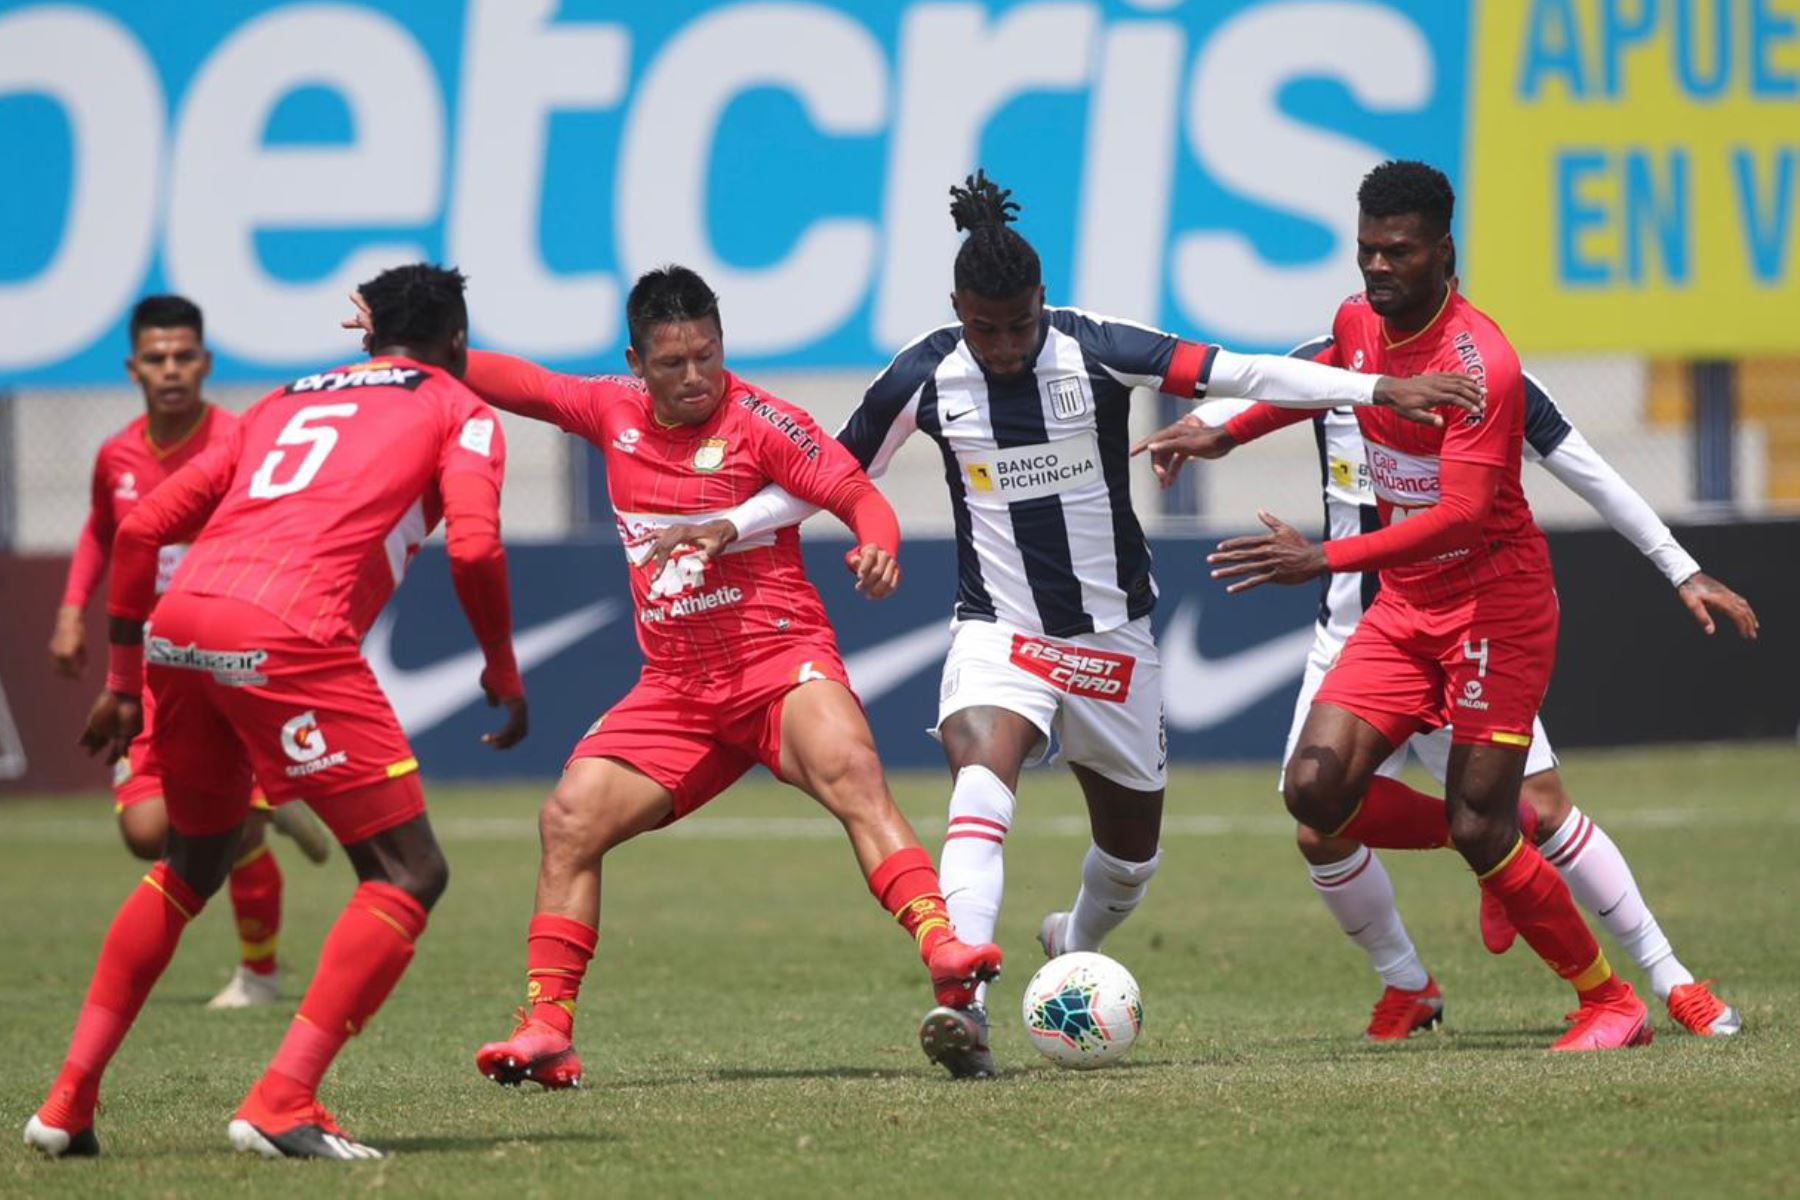 Alianza Lima y Sport Huancayo se enfrentan por la jornada 12 de la Liga 1, en elestadio Iván Elías Moreno de Villa El Salvador. Foto: @LigaFutProf